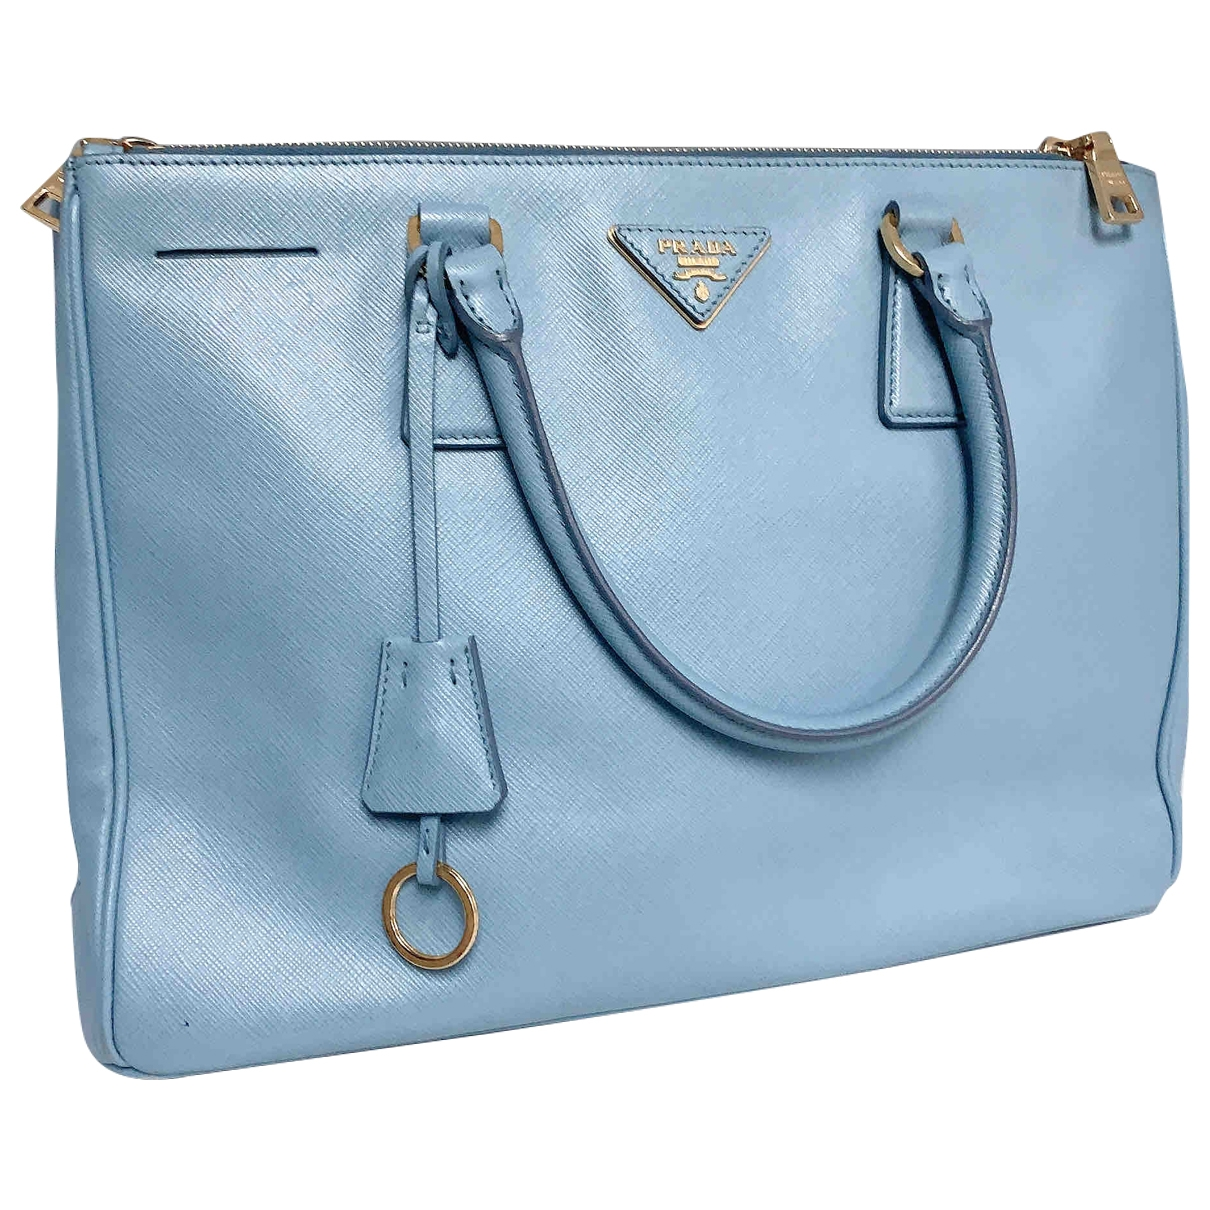 Prada Galleria Handtasche in  Blau Leder